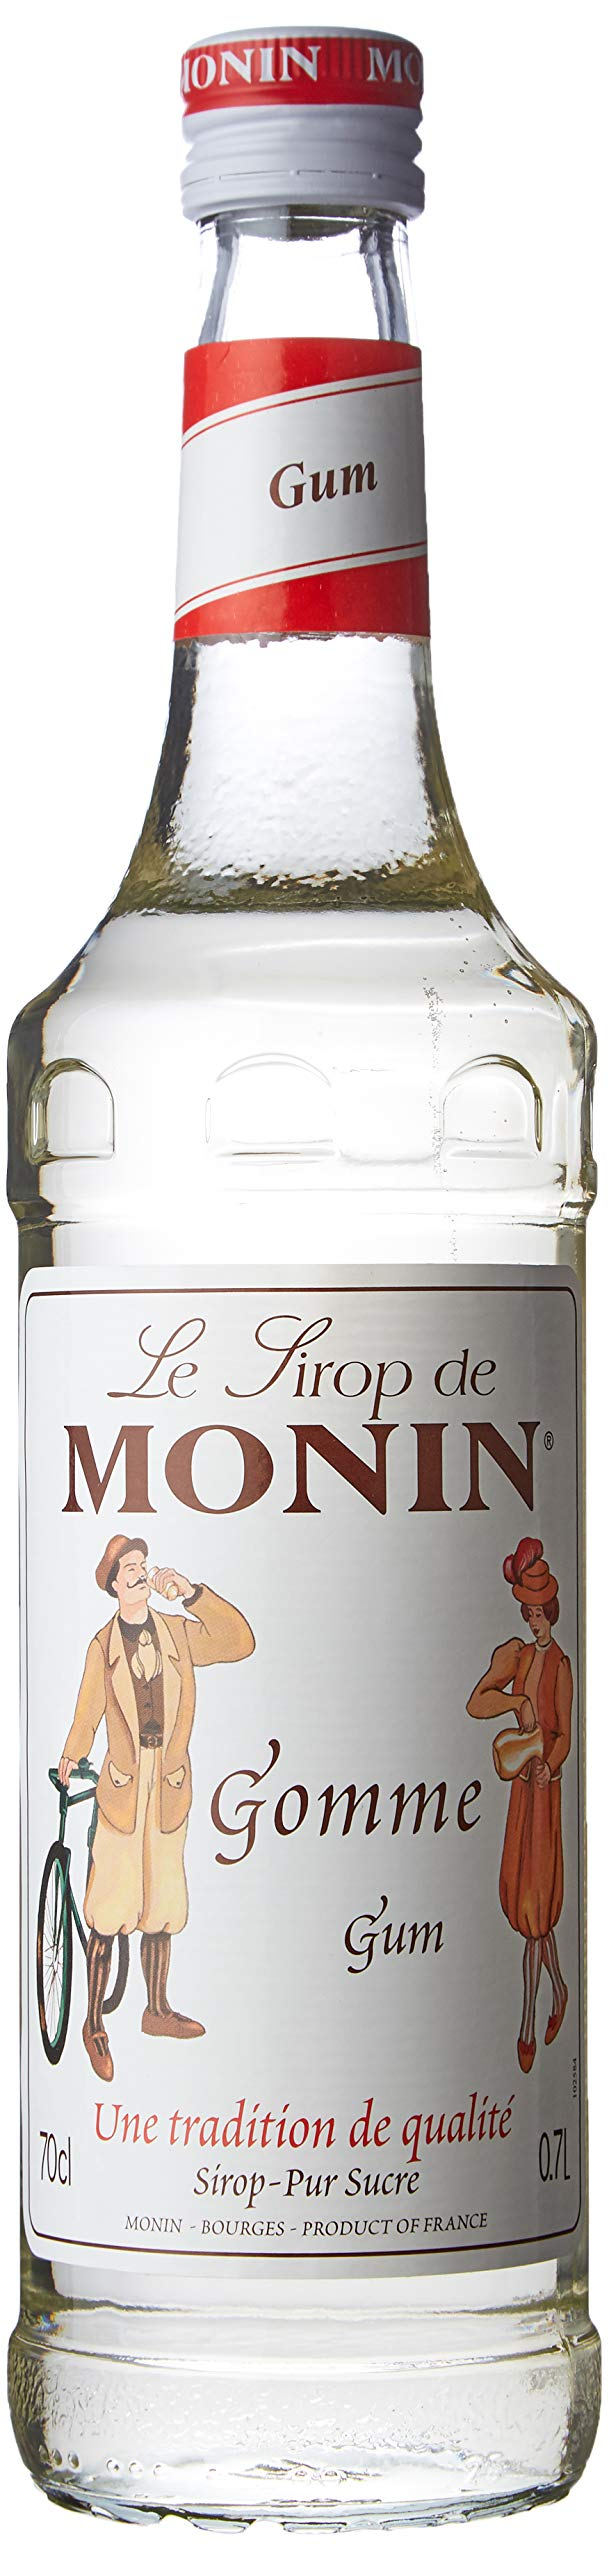 MONIN Premium Gum Syrup 700 ml